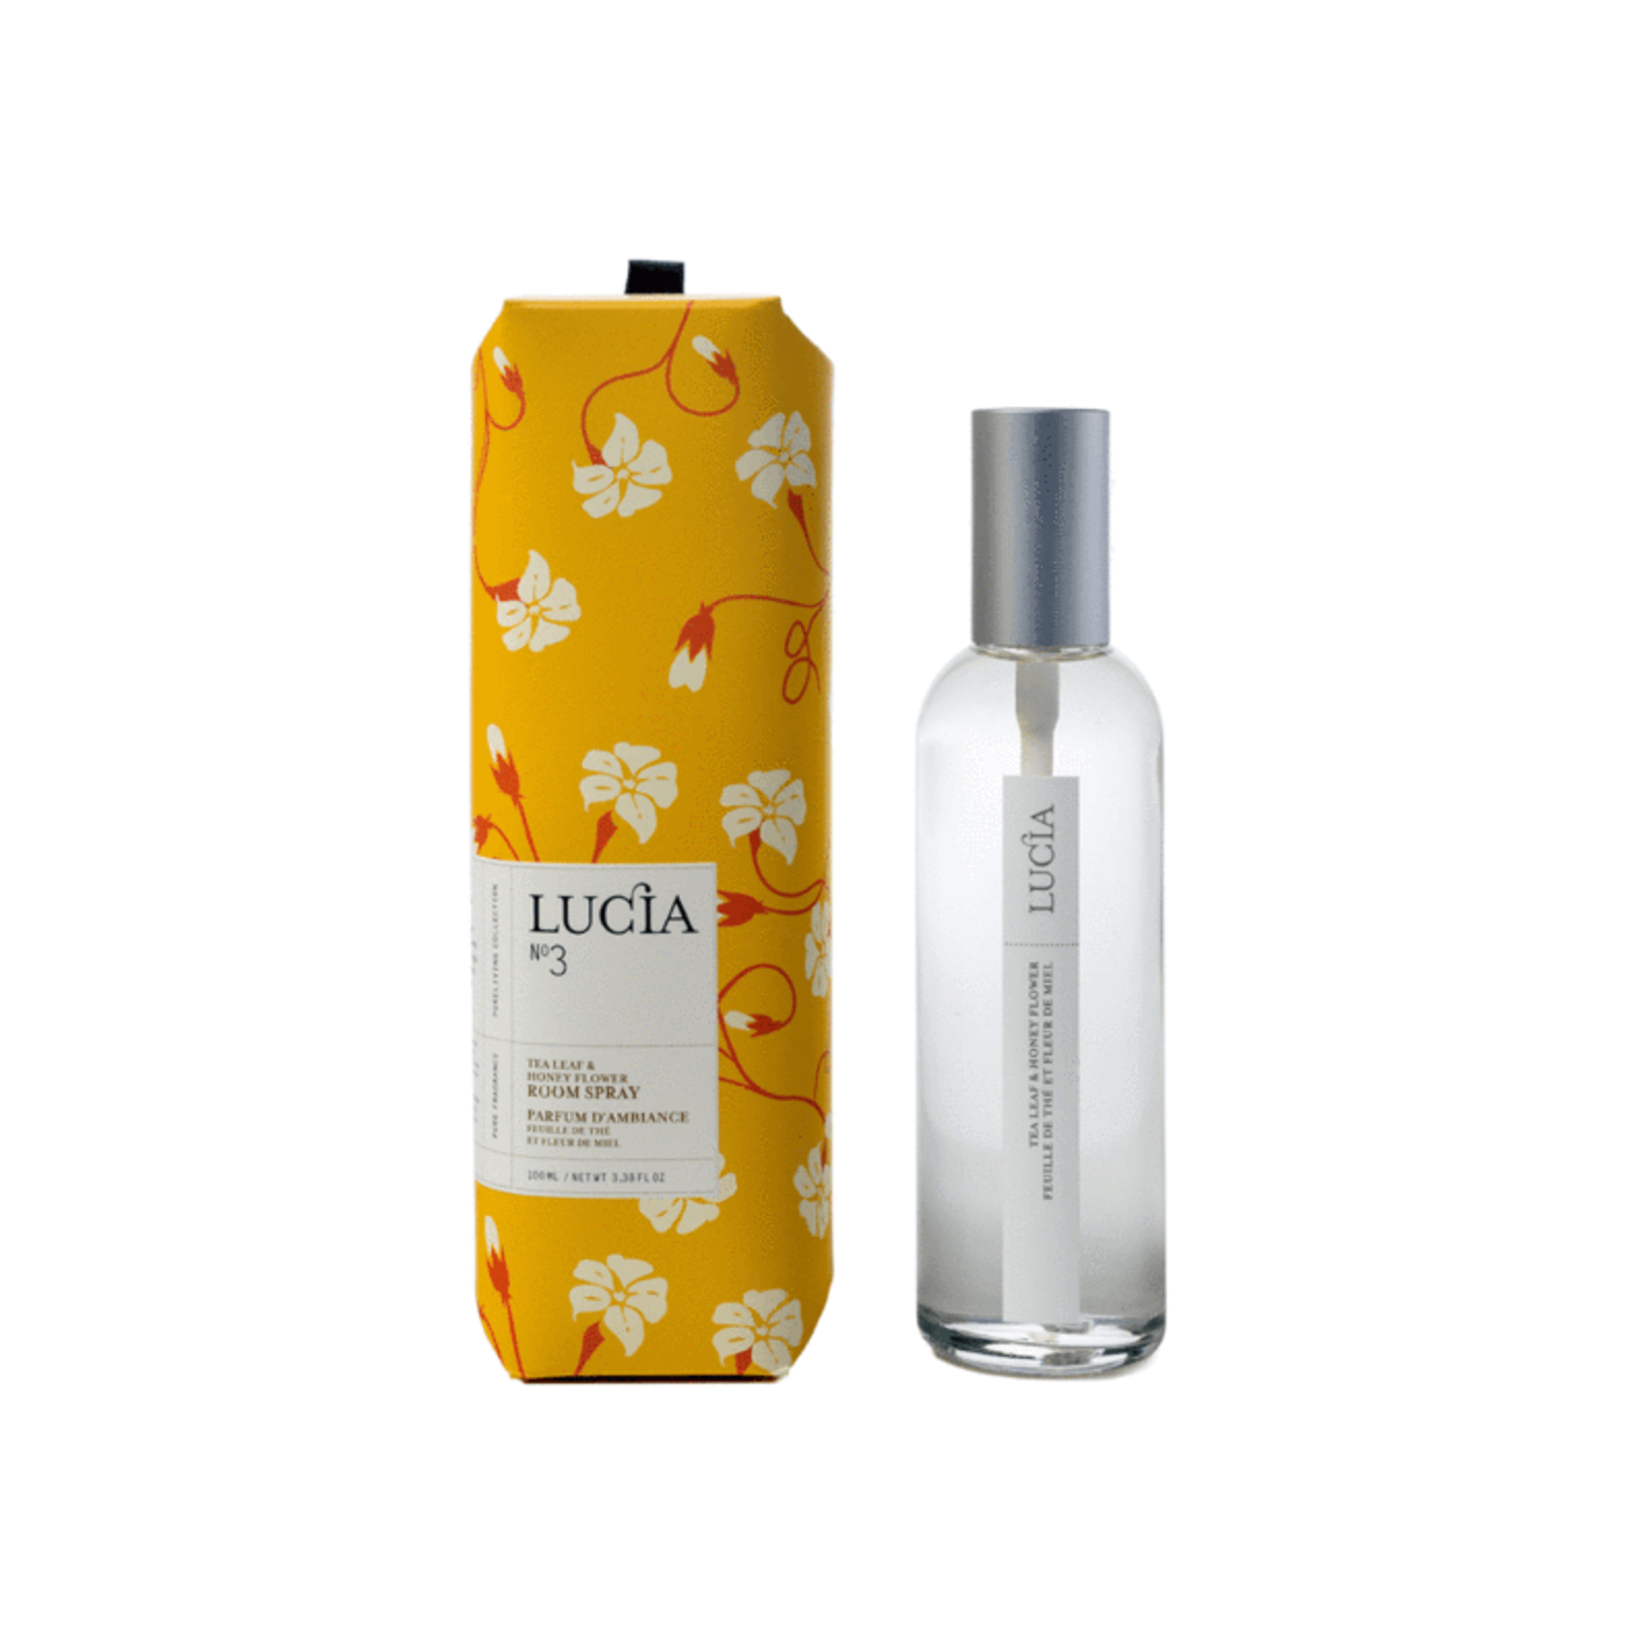 Lucia LUCIA Parfum d'ambiance no3